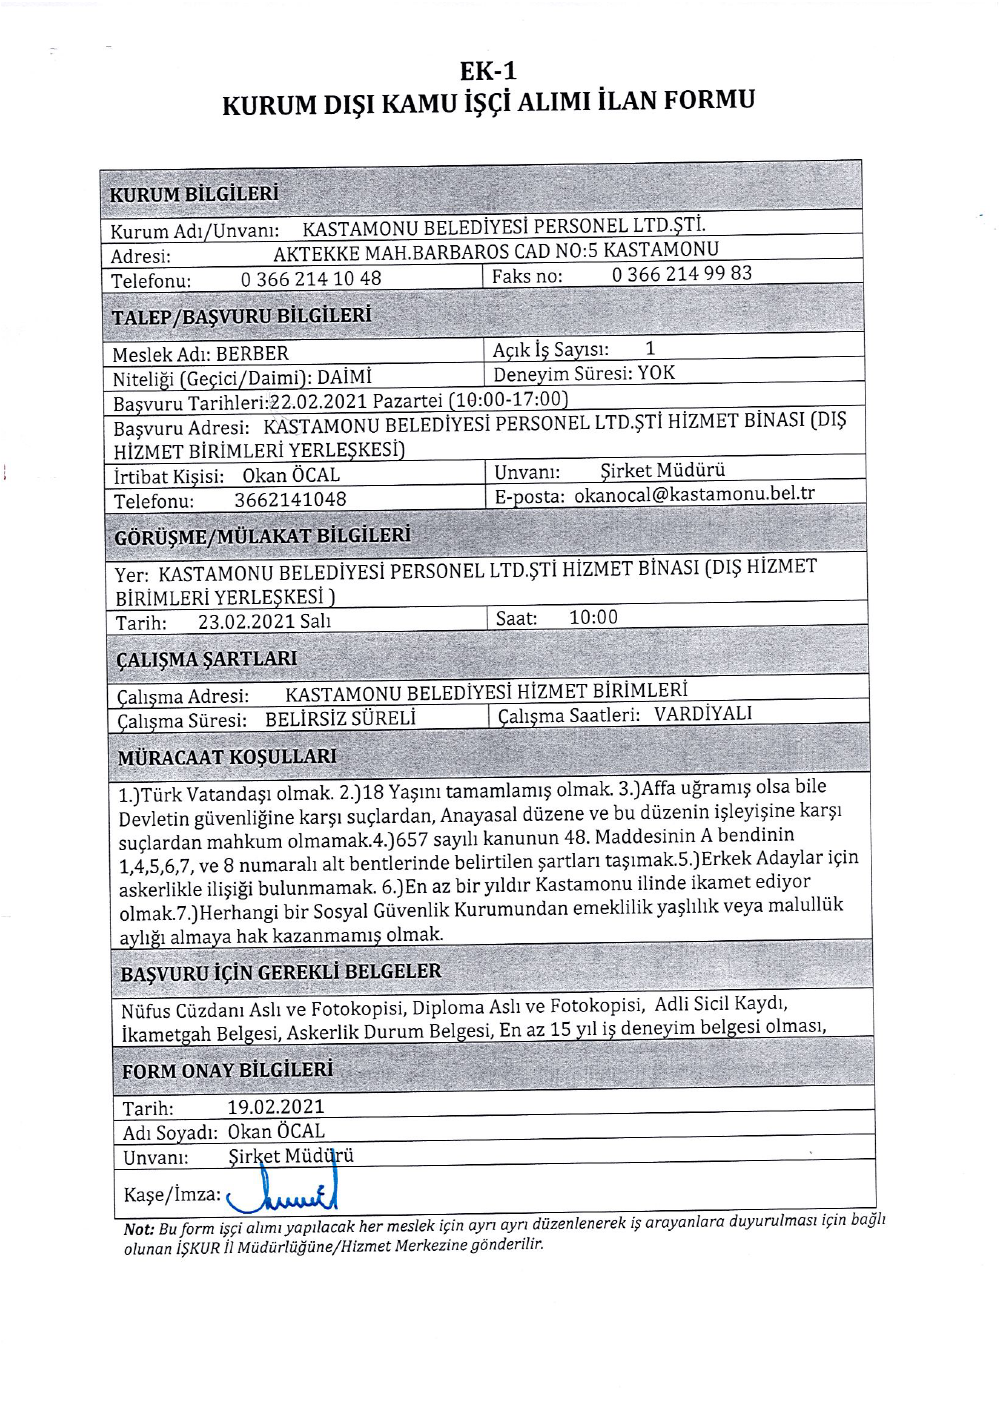 kastamonu-belediyesi-pers-ltd-sti-22-02-2021-000002.png